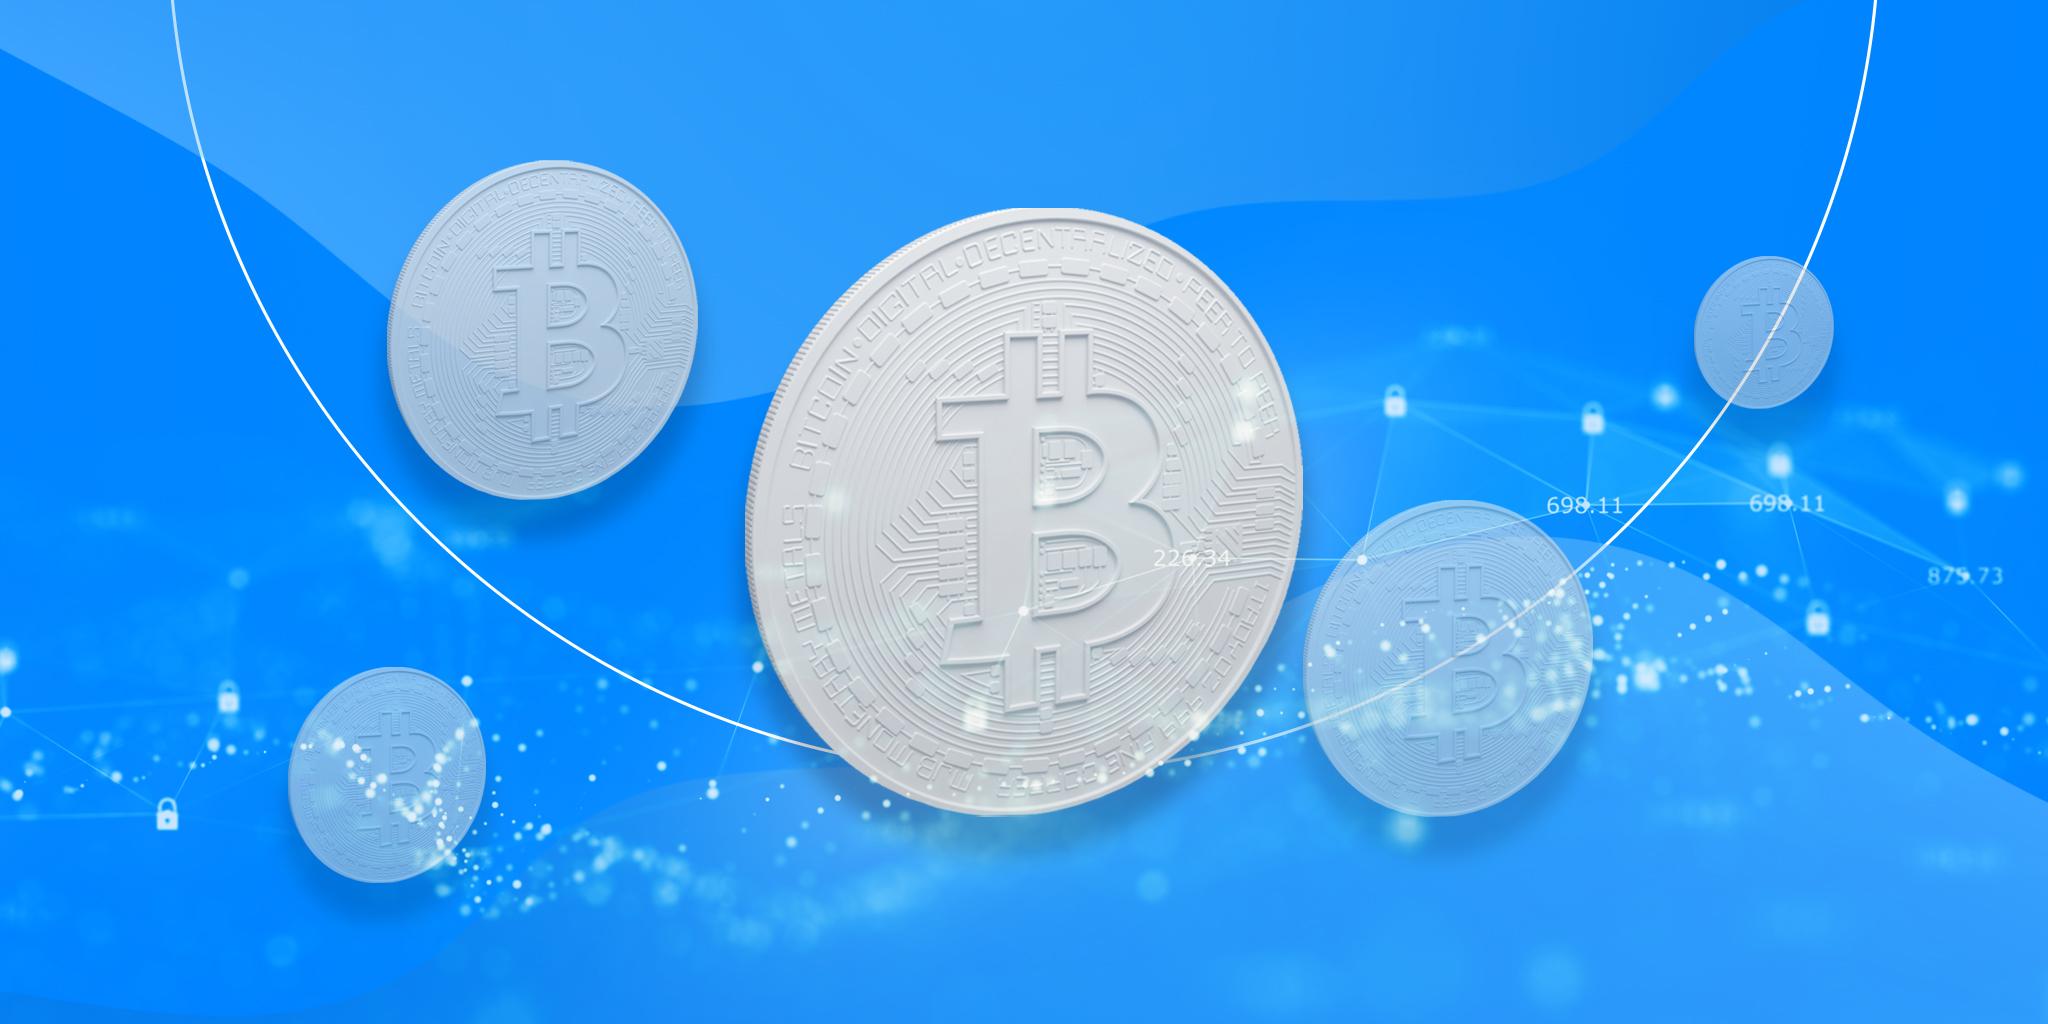 Market update: Bitcoin takes the lead in Q4 bull run